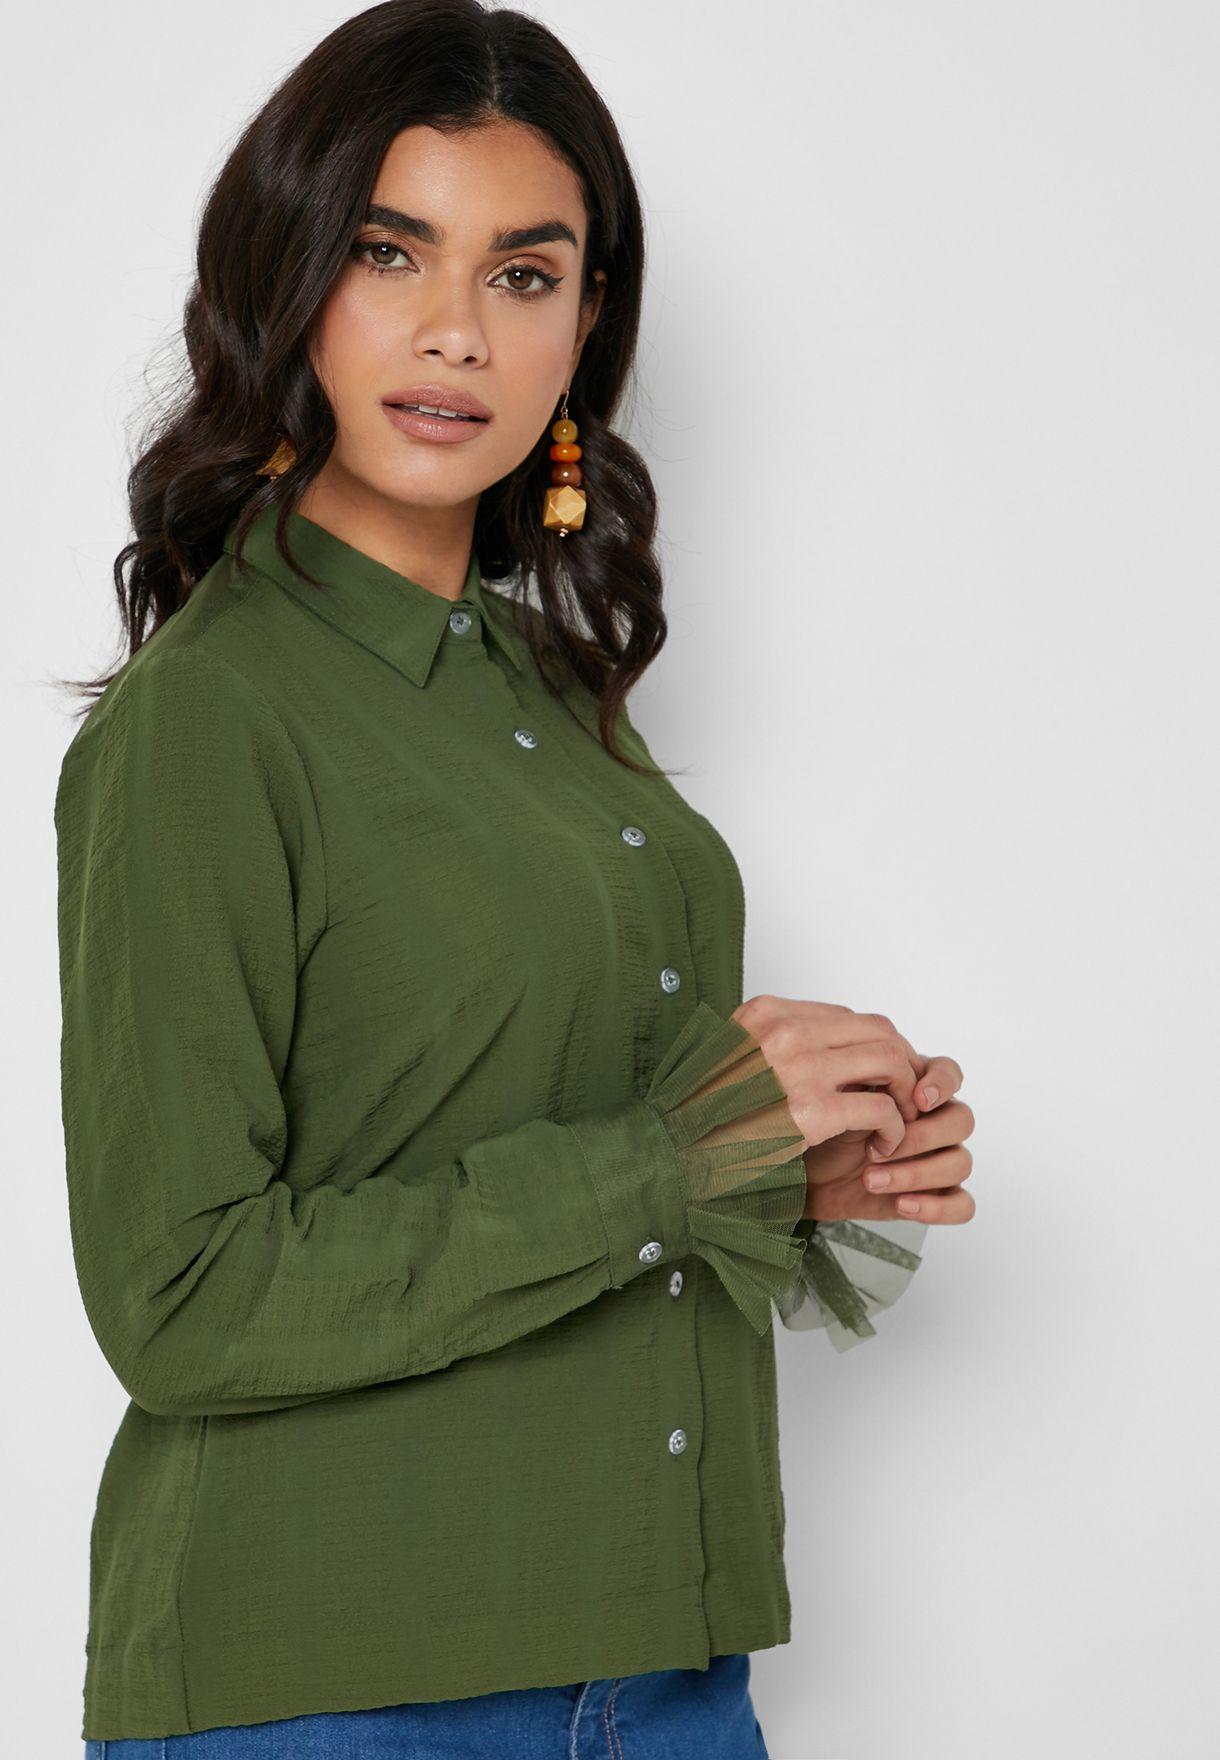 Fringe Cuffed Shirt